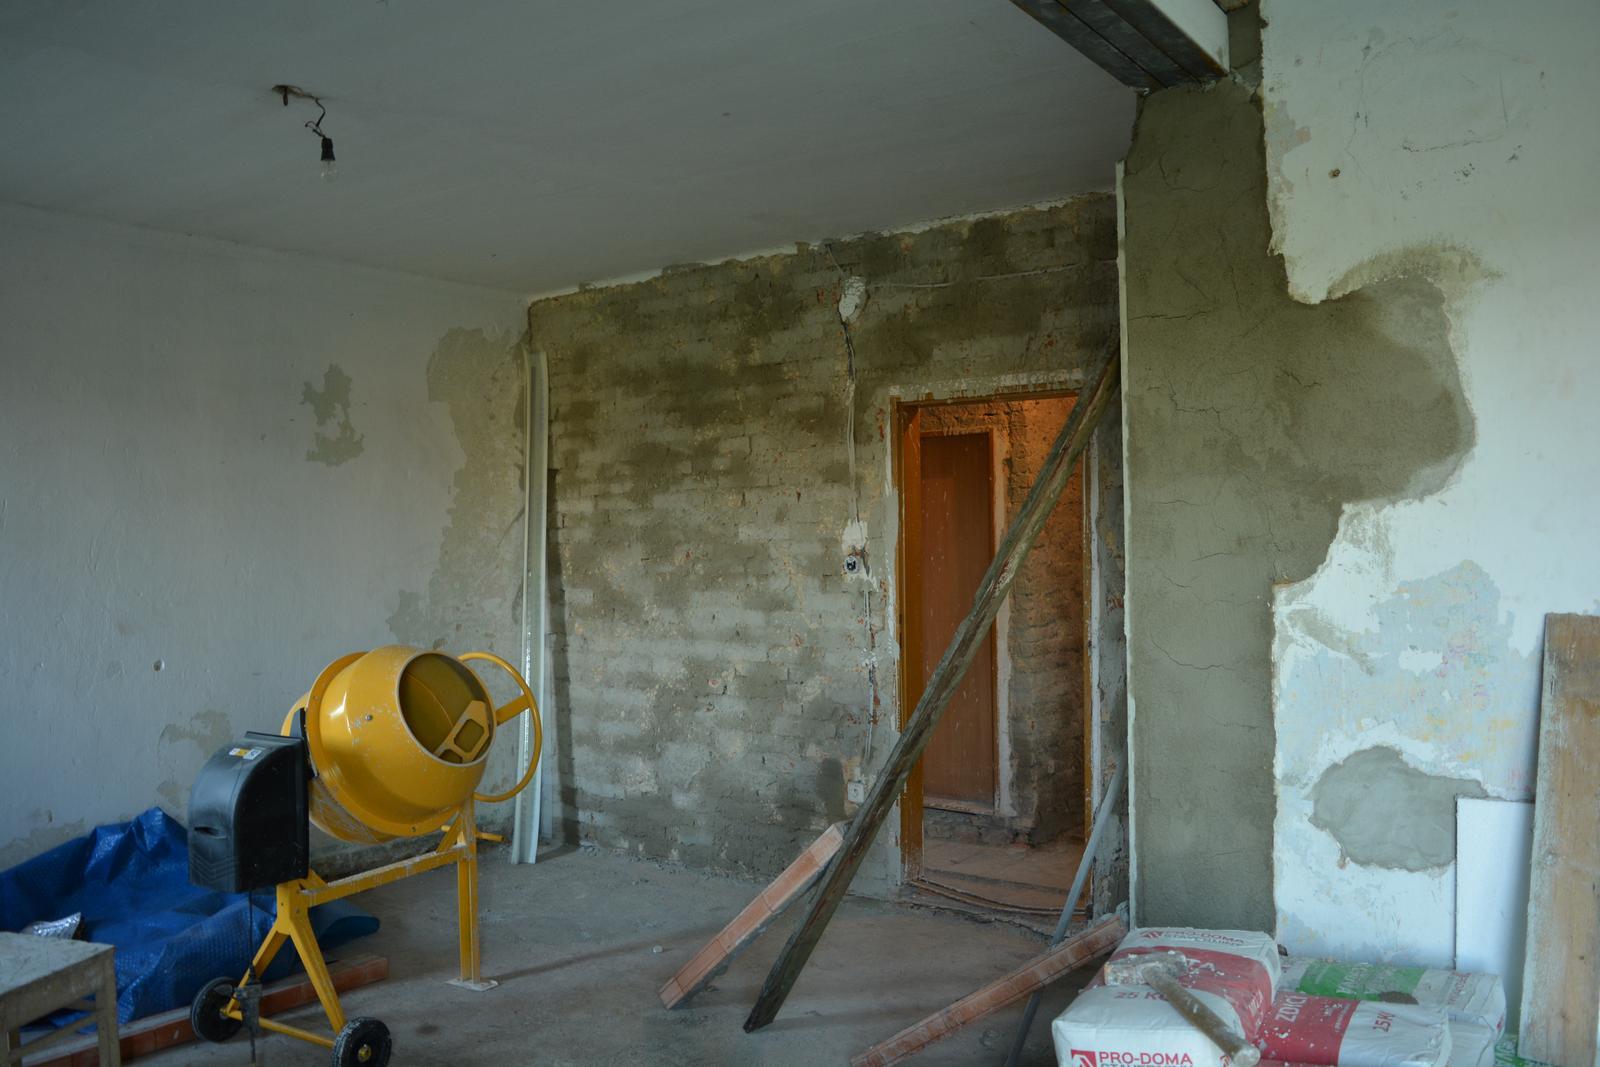 Náš nový domov ... - Obrázek č. 61